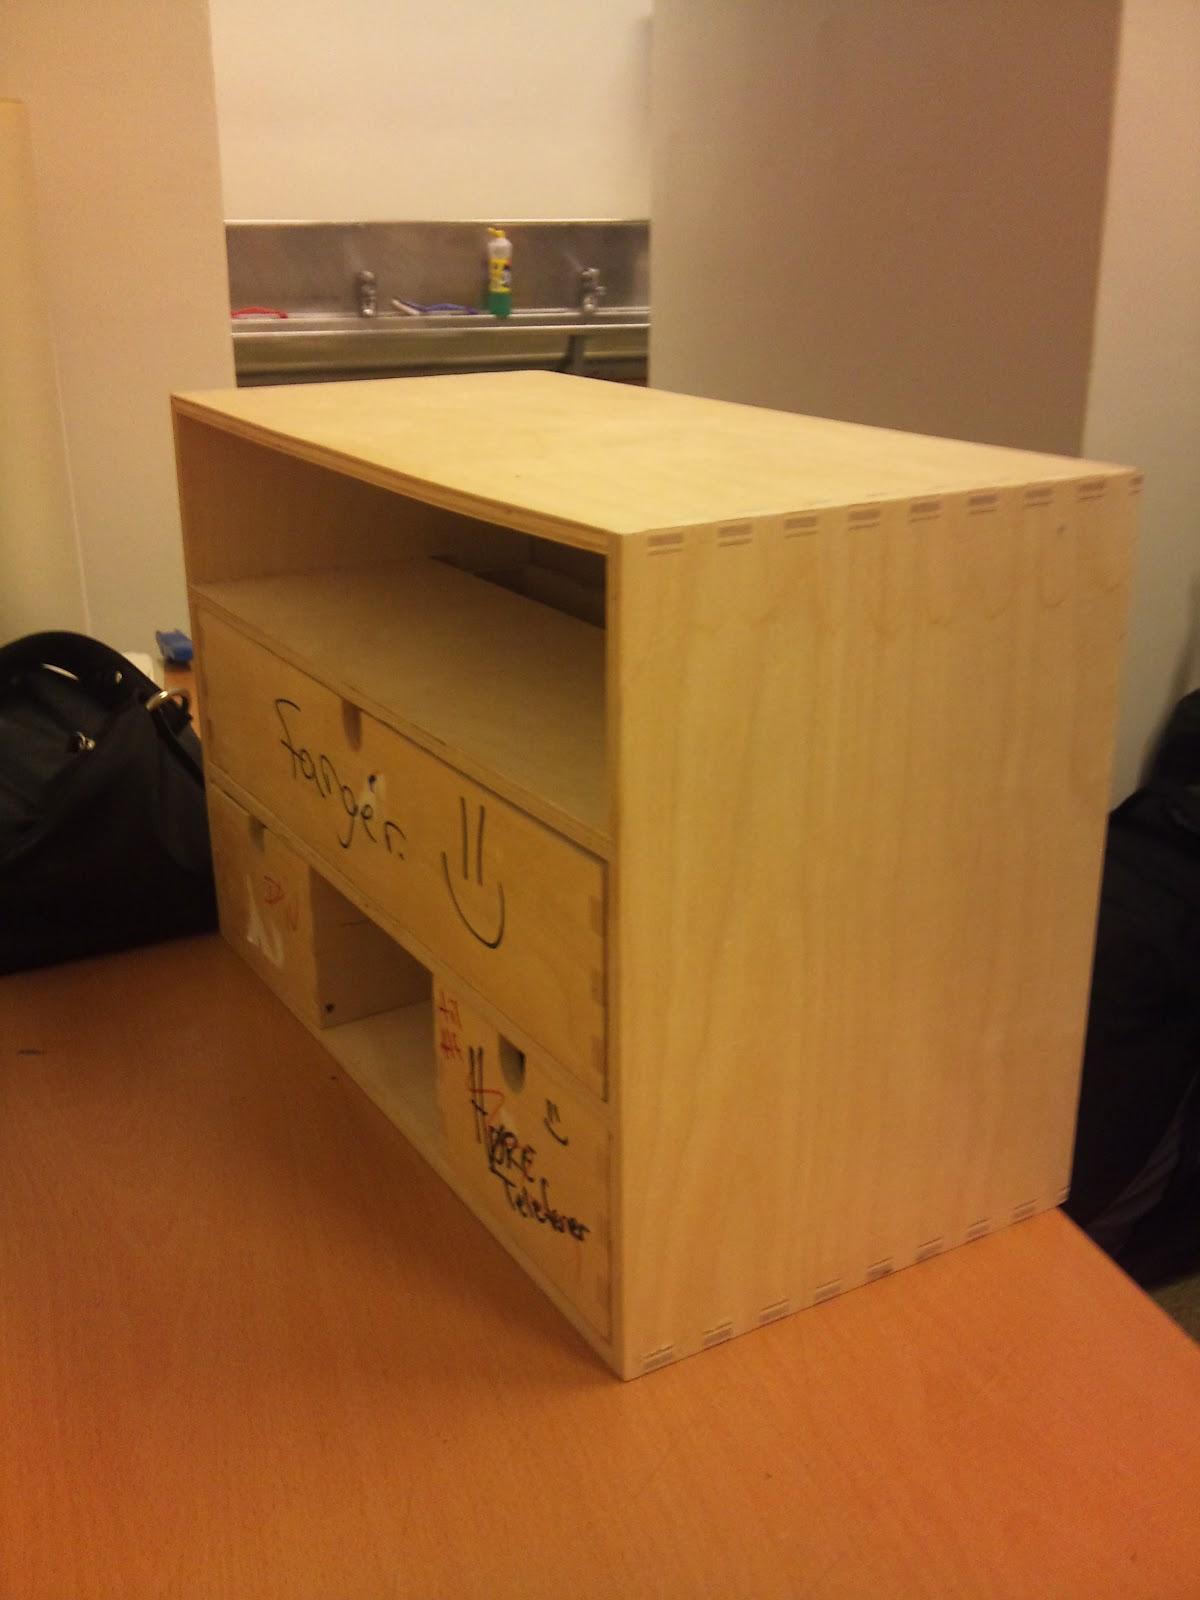 Møbler Elverum: Taigaen. Design og Tekstil VG: Redesign av et møbel ...